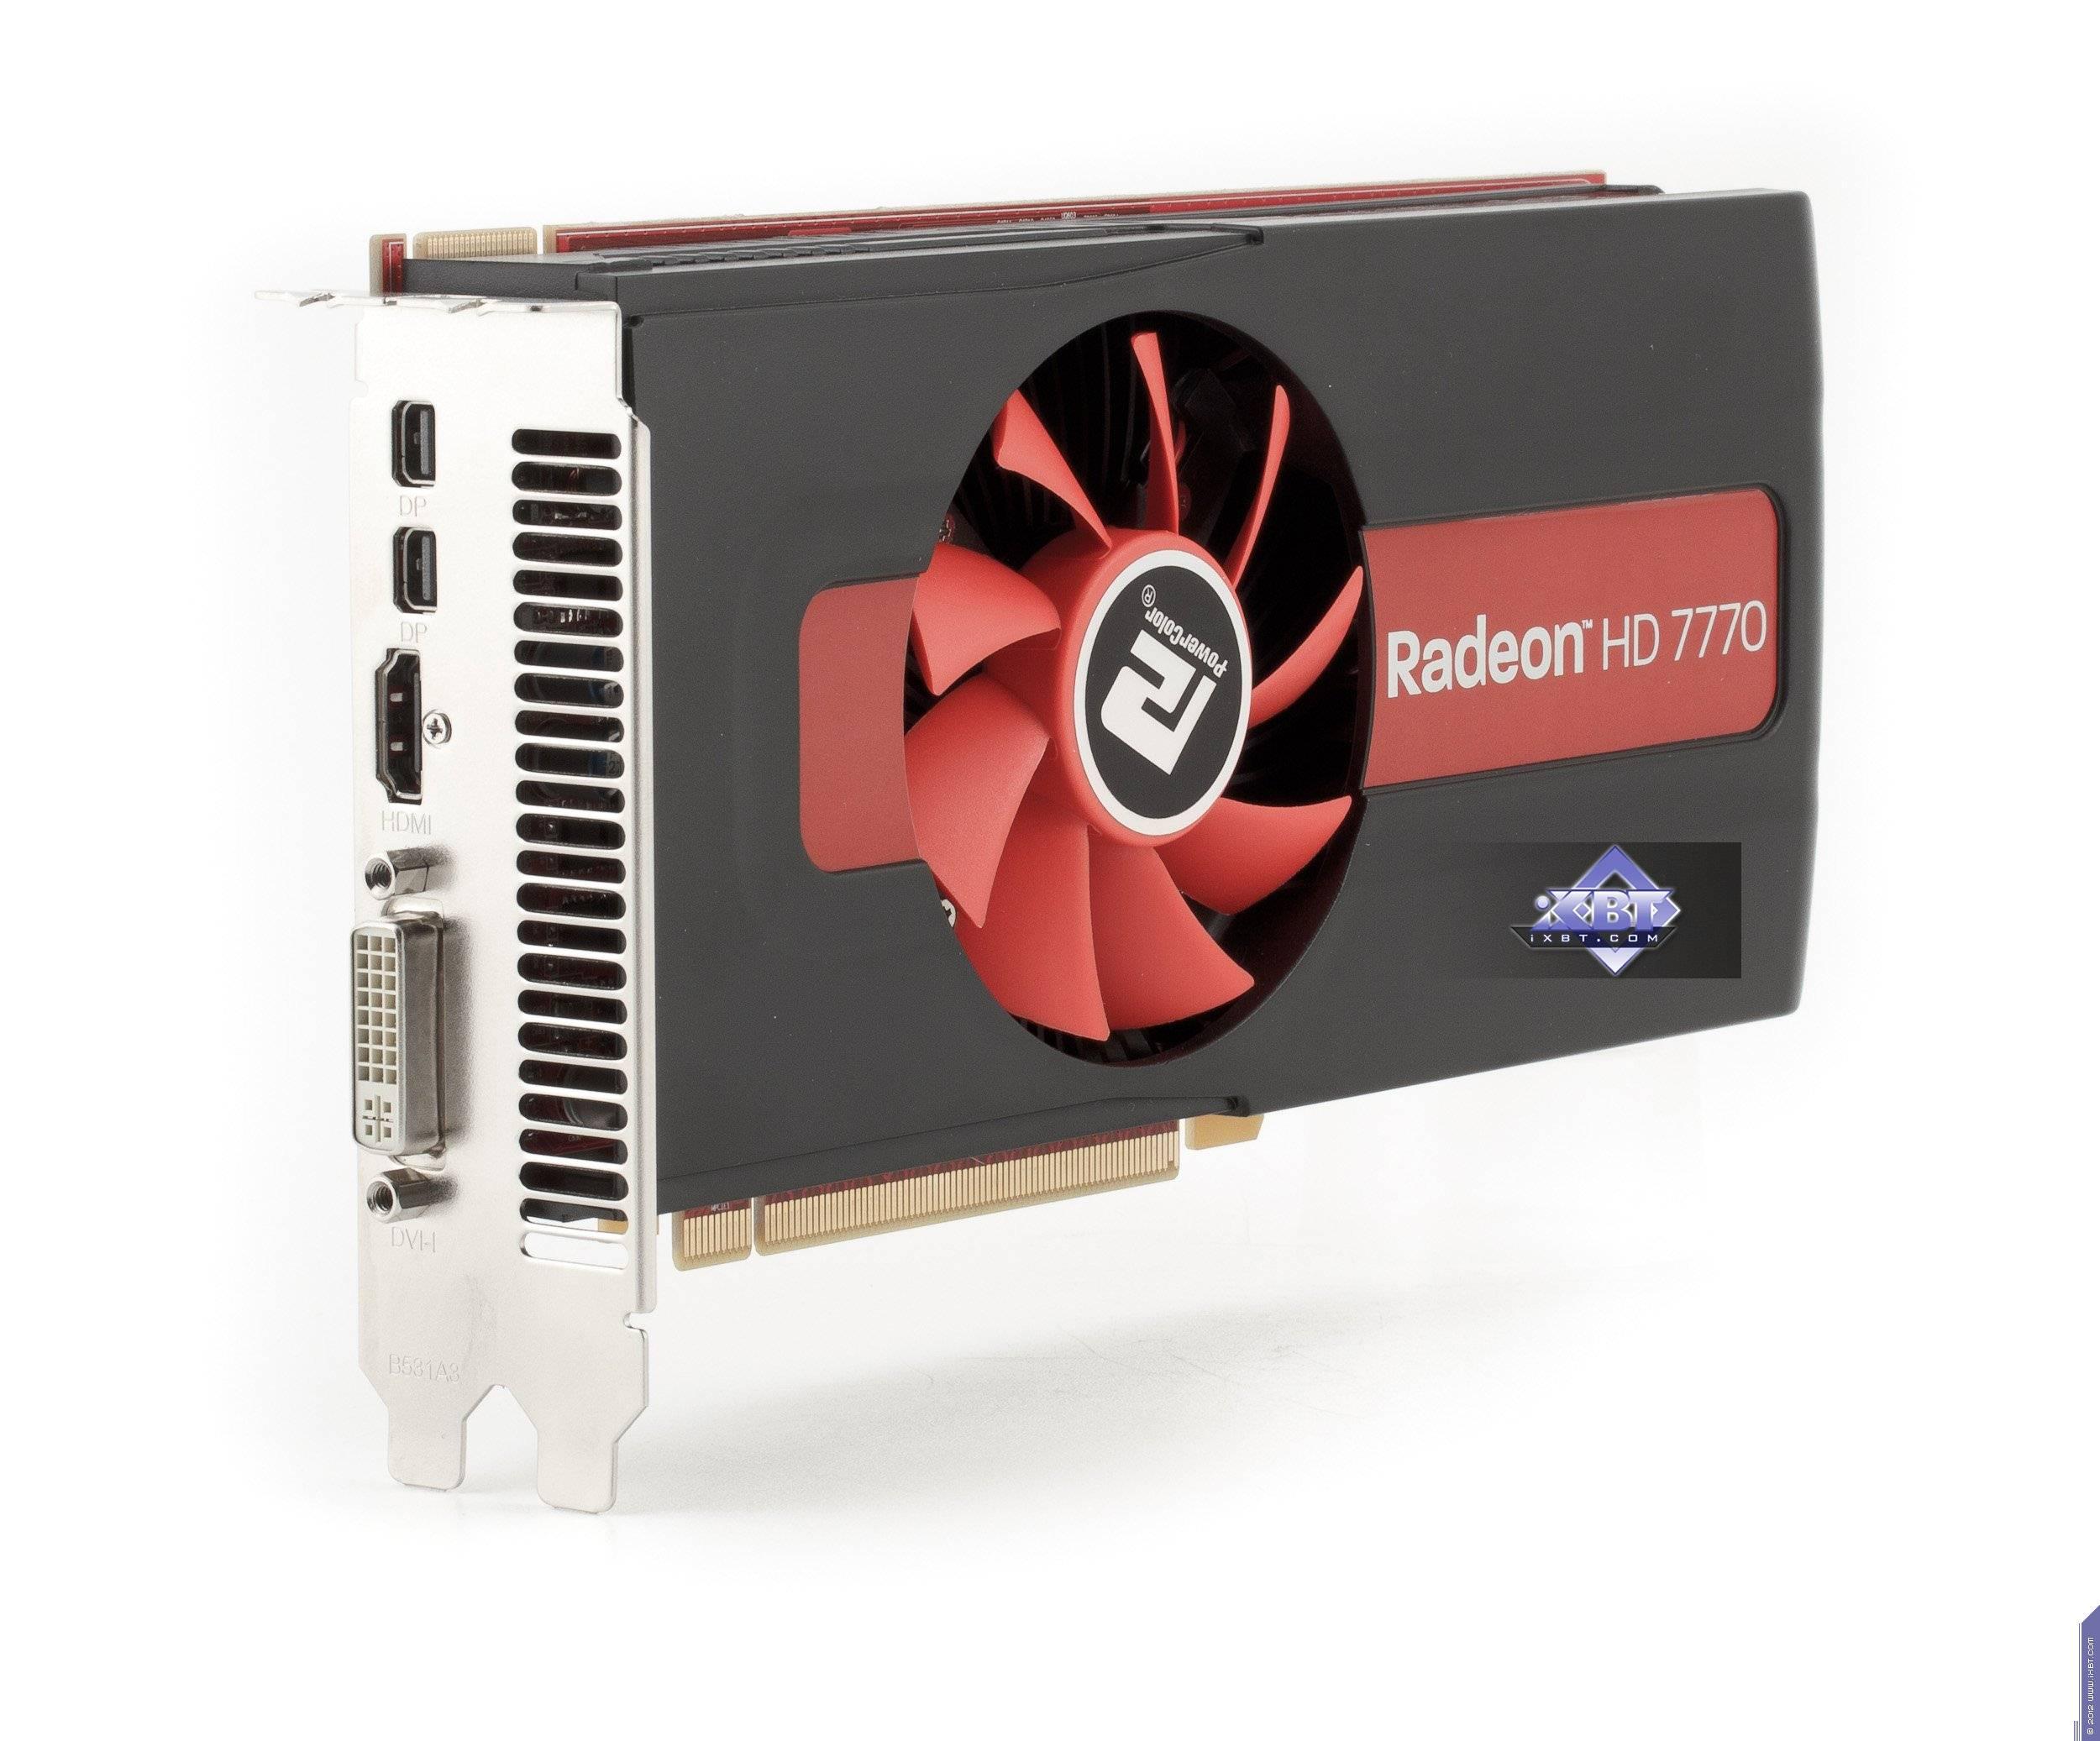 Pubg Radeon Hd 7770: AMD Radeon HD 7770/7750